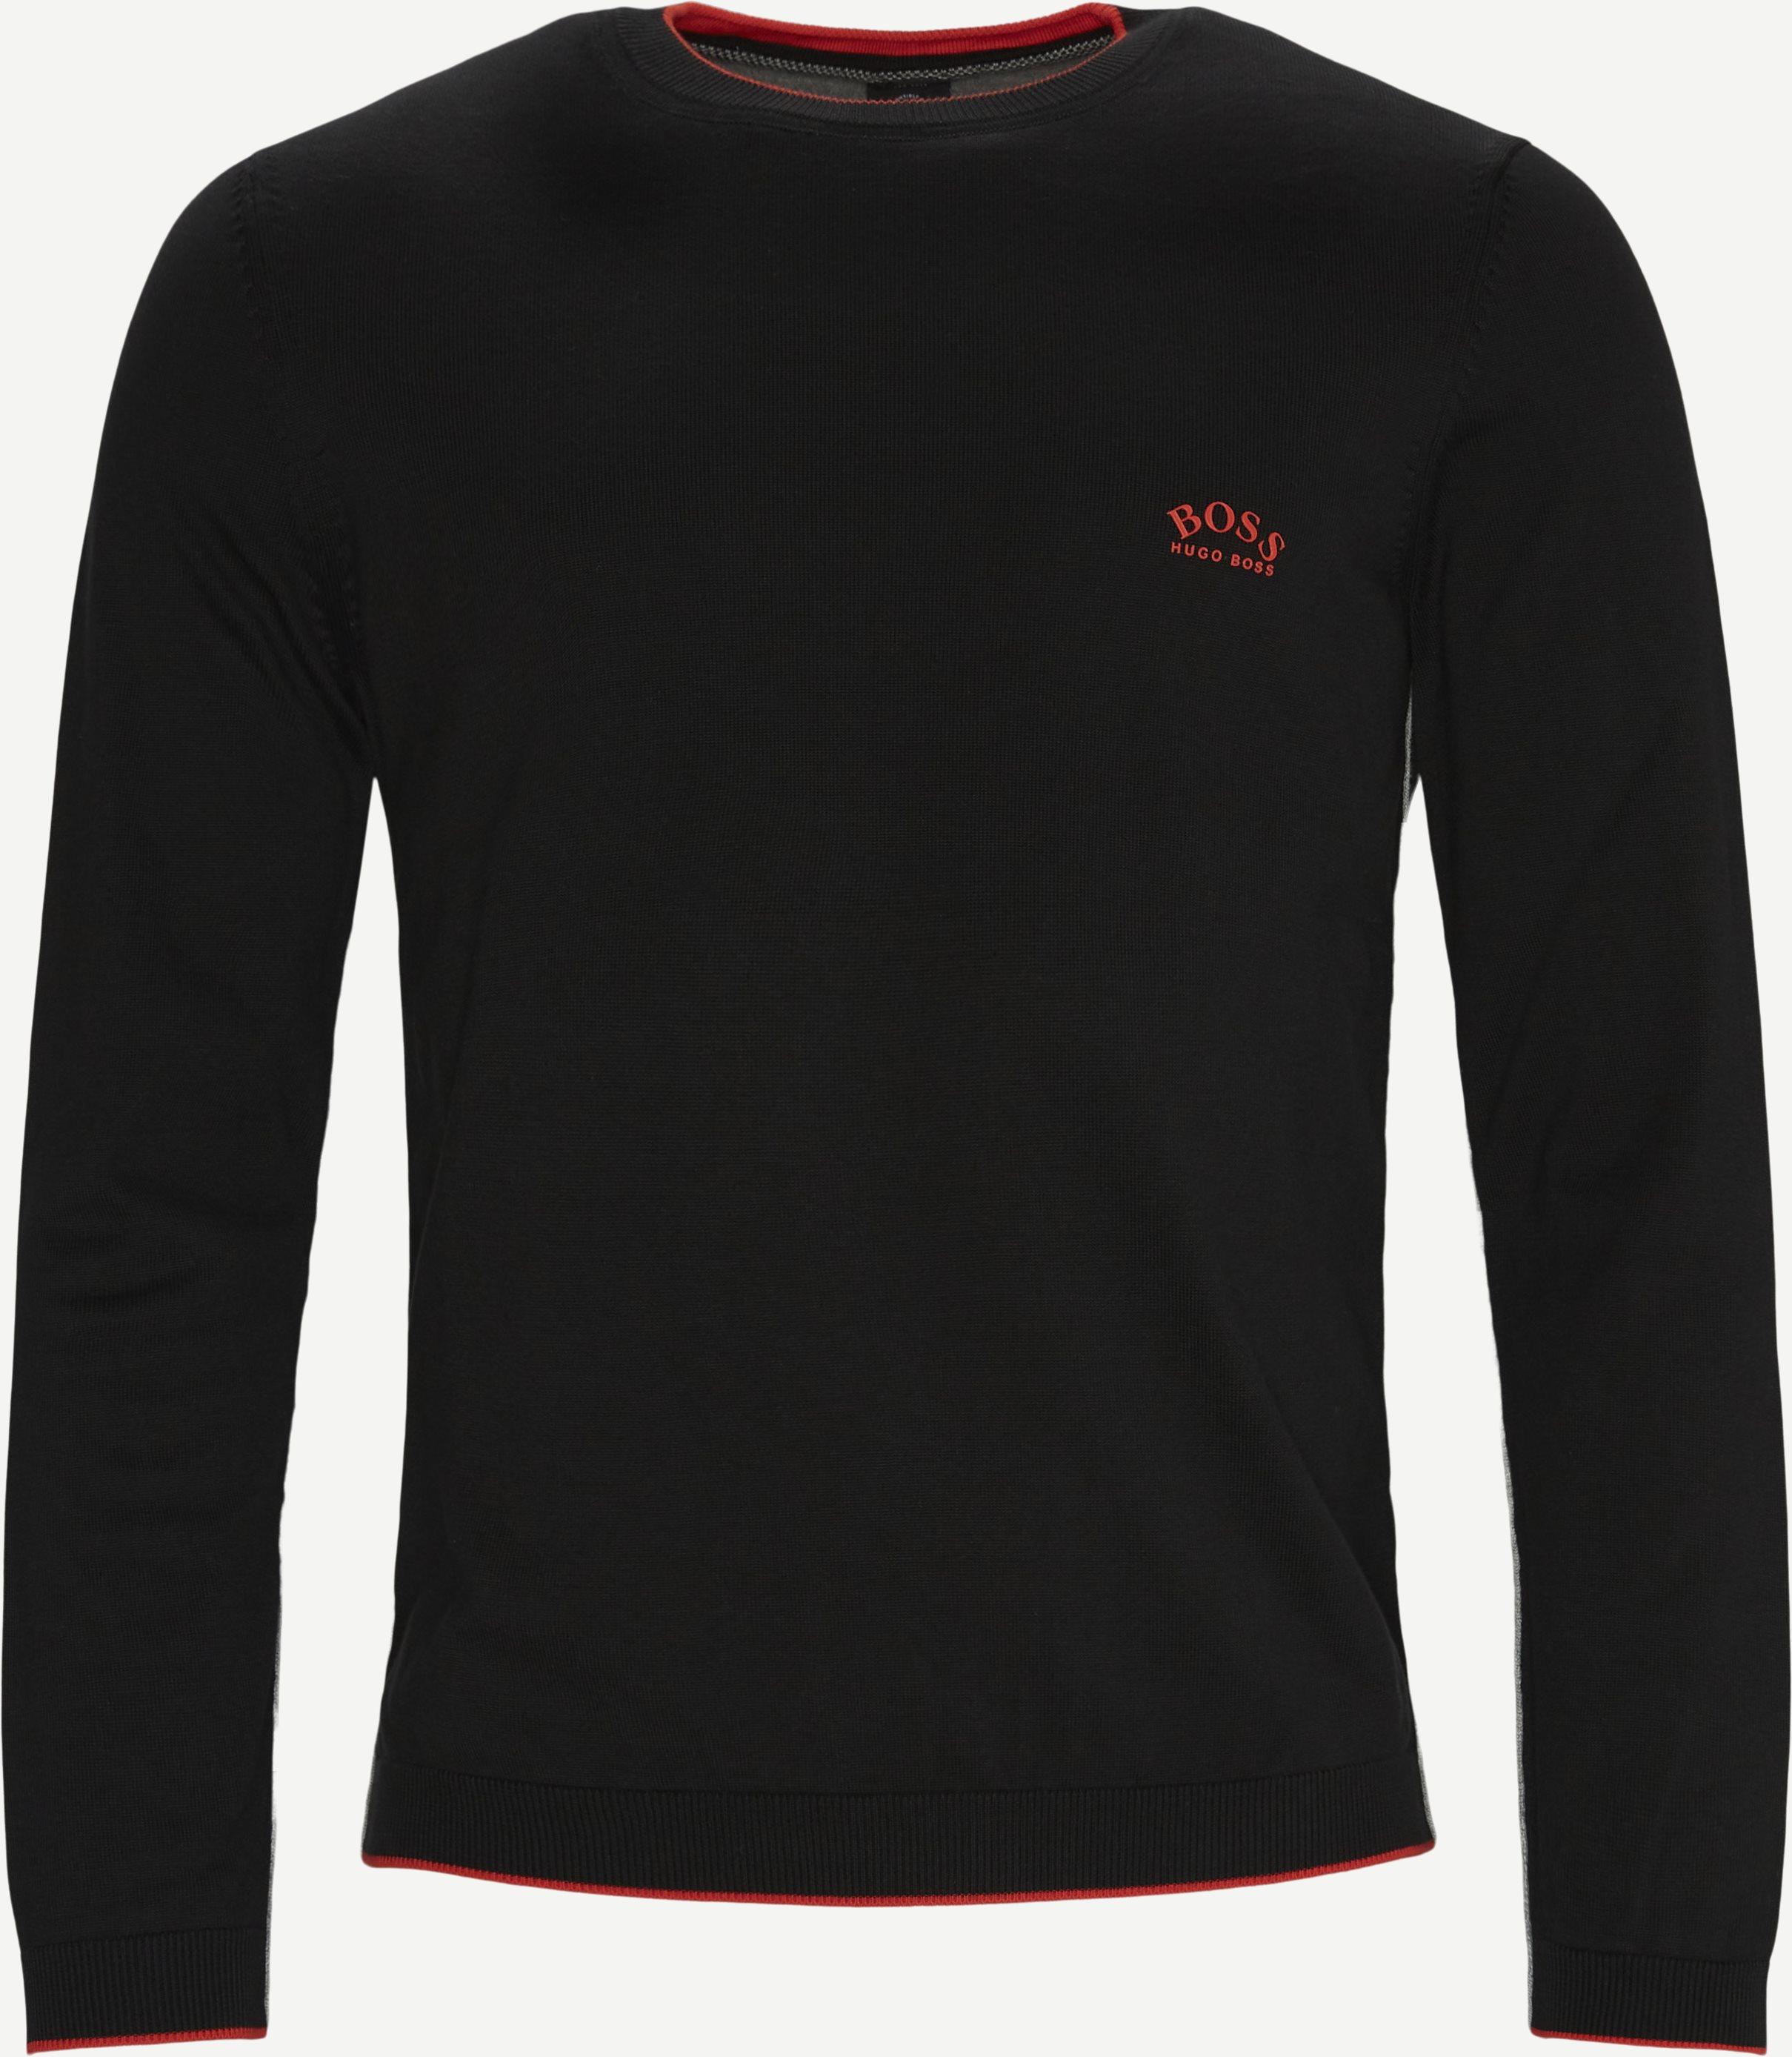 Riston Striktrøje - Knitwear - Regular - Black